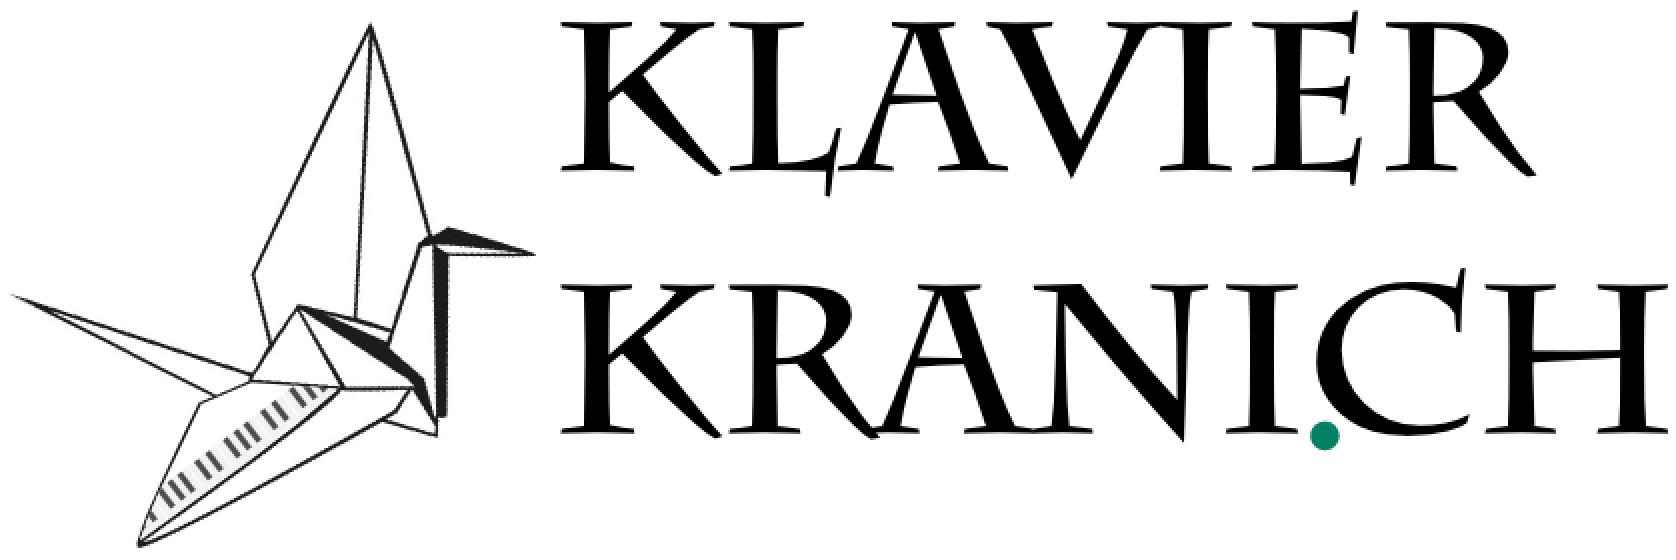 KlavierKranich